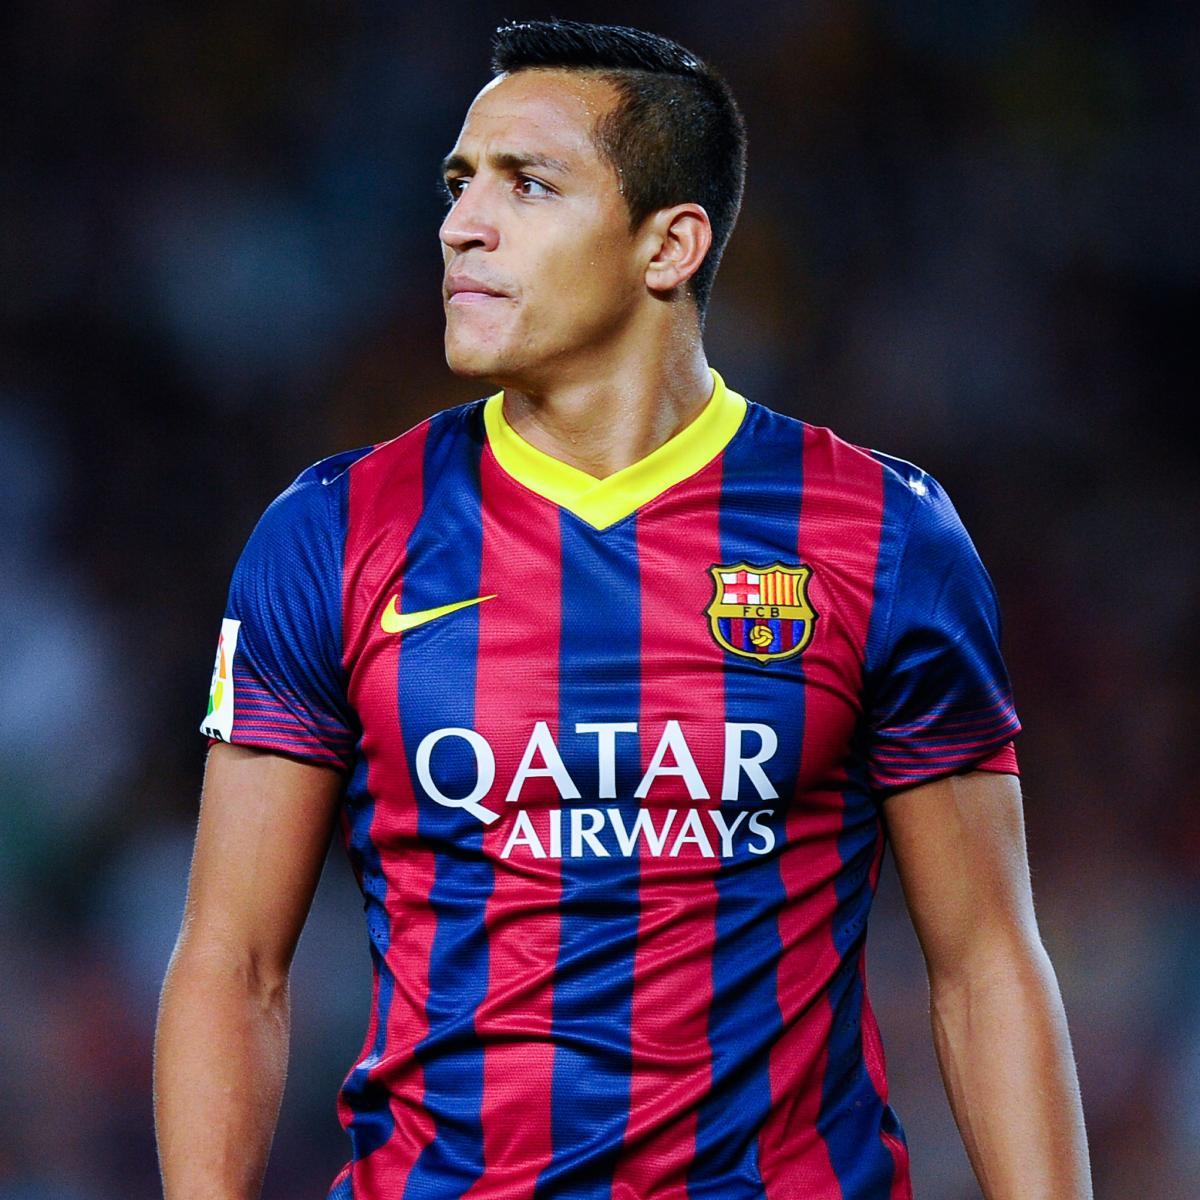 Manchester United Transfer News Alexis Sanchez Rumours: Alexis Sanchez Happy At Barcelona Amid Manchester United